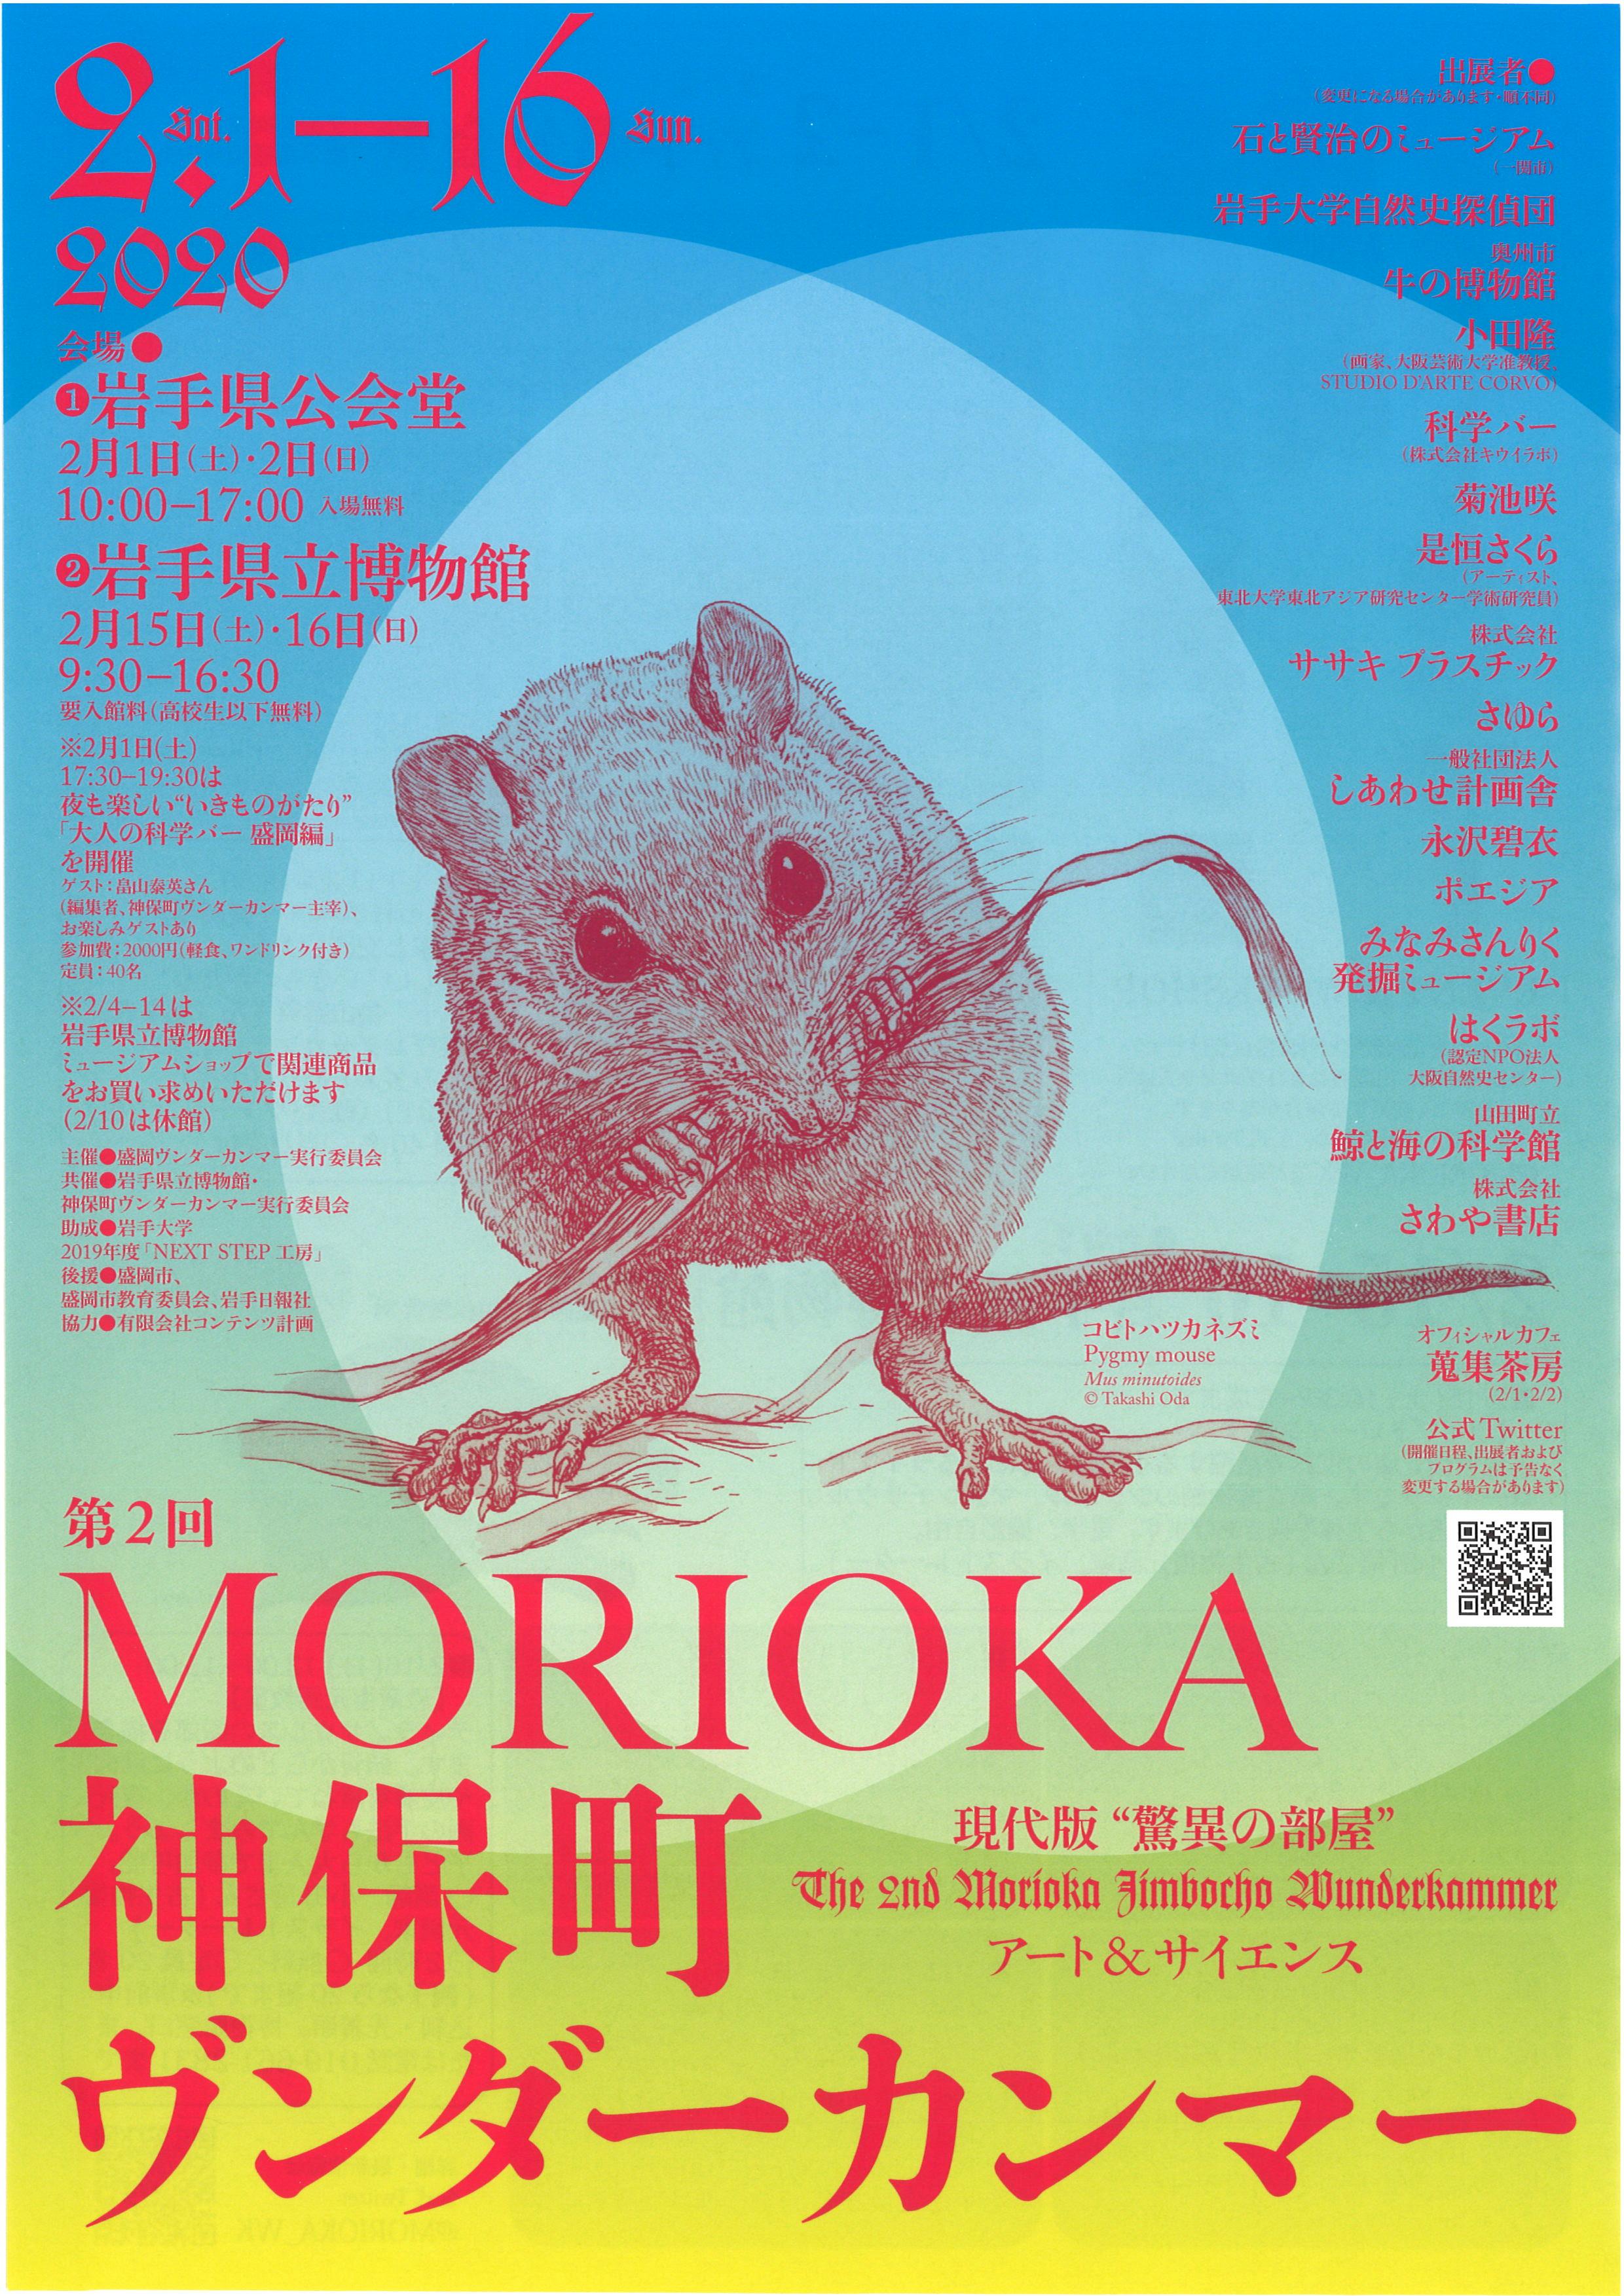 MORIOKA神保町ヴンダ―カンマ―